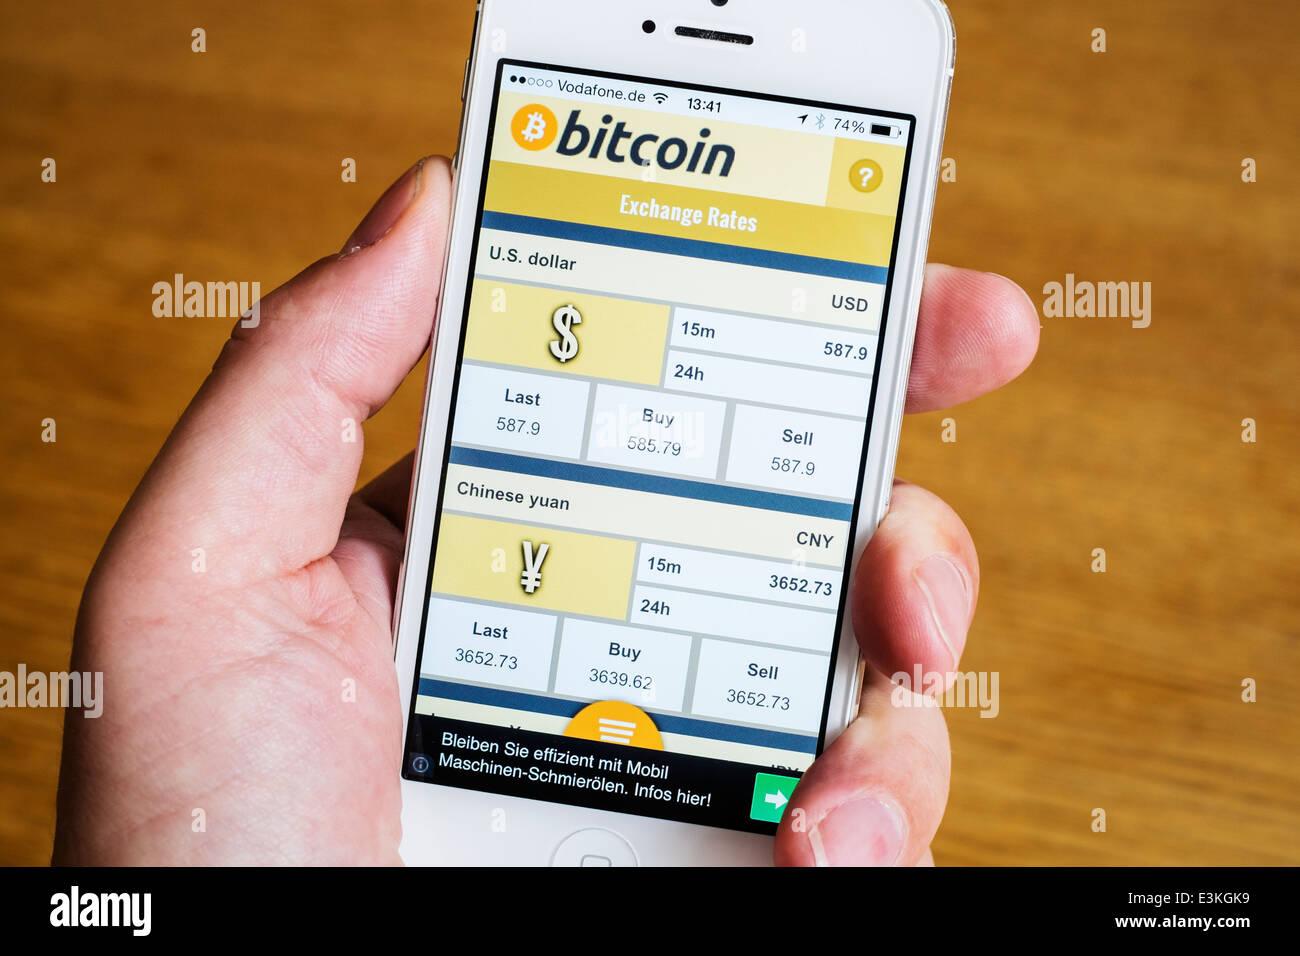 Bitcoin stocks iphone